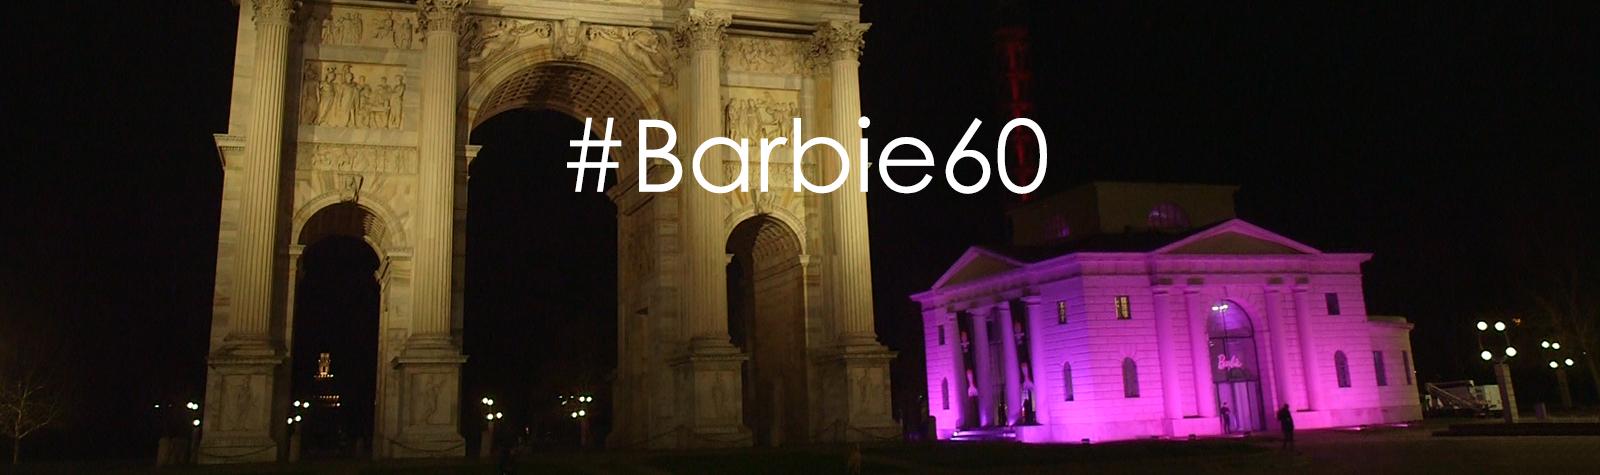 #Barbie60